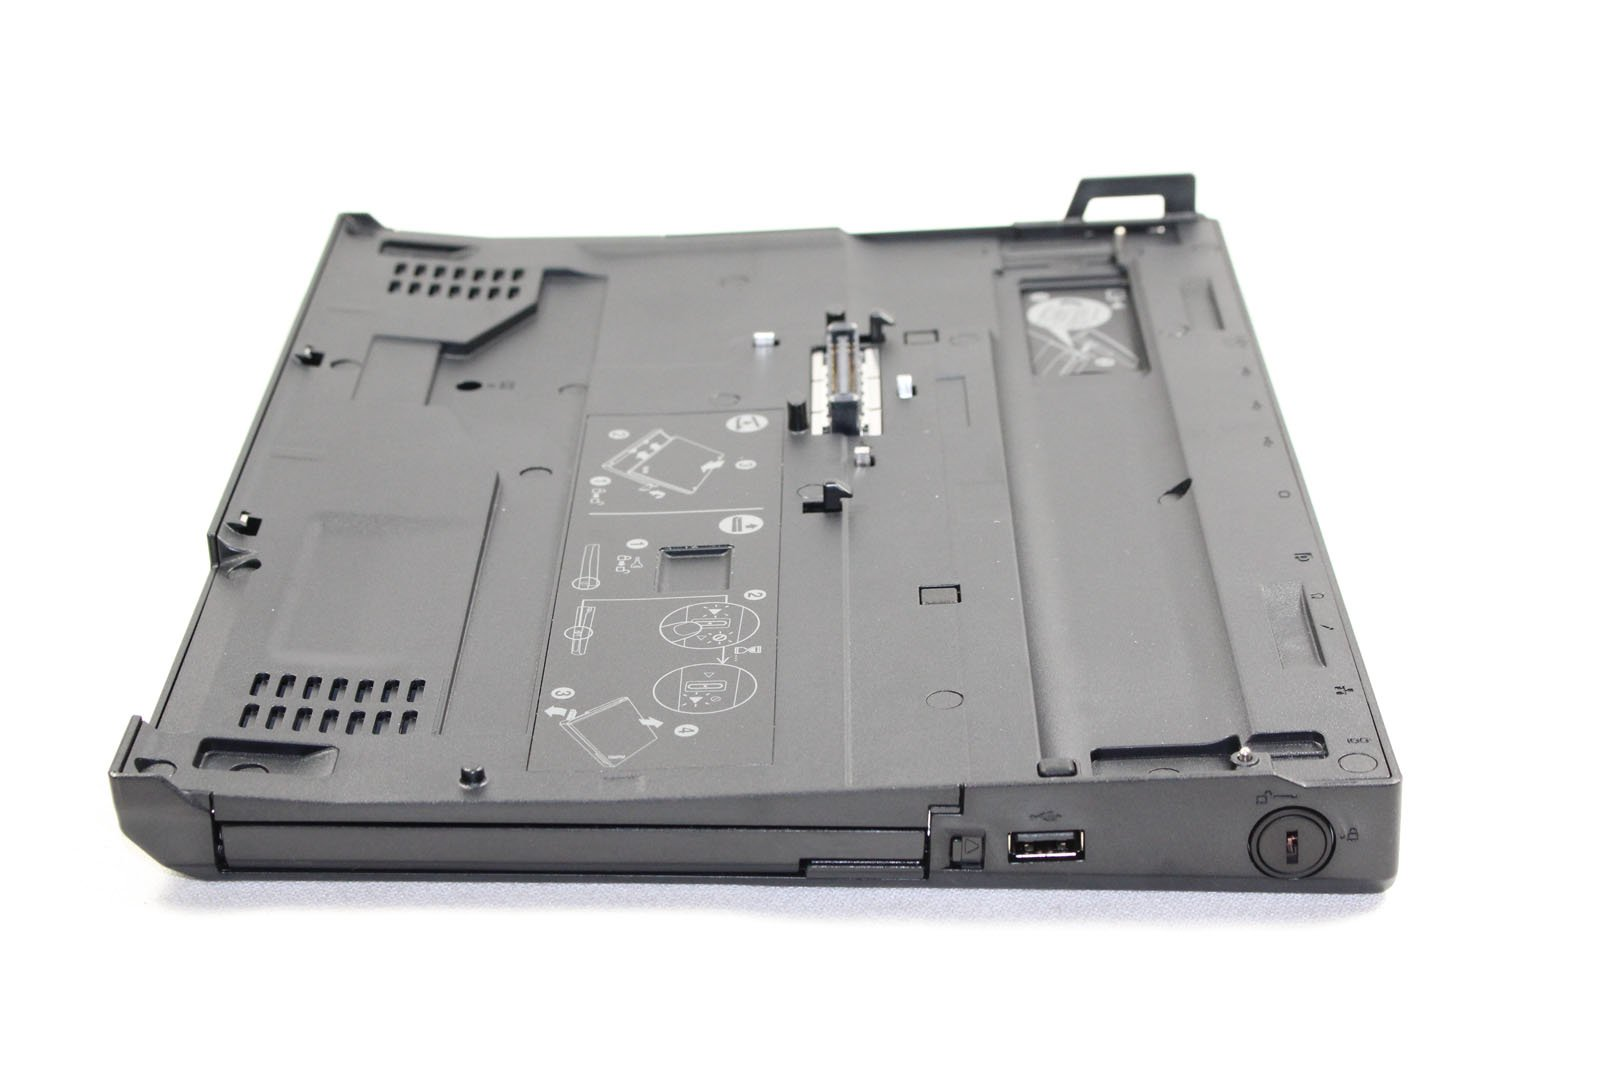 43R8781 - Lenovo ThinkPad X200 UltraBase Docking station Network, USB, Display/Video, VGA, Microphone, Headphone, Stereo, Docking/Port Replicator by Lenovo Group Limited (Image #5)